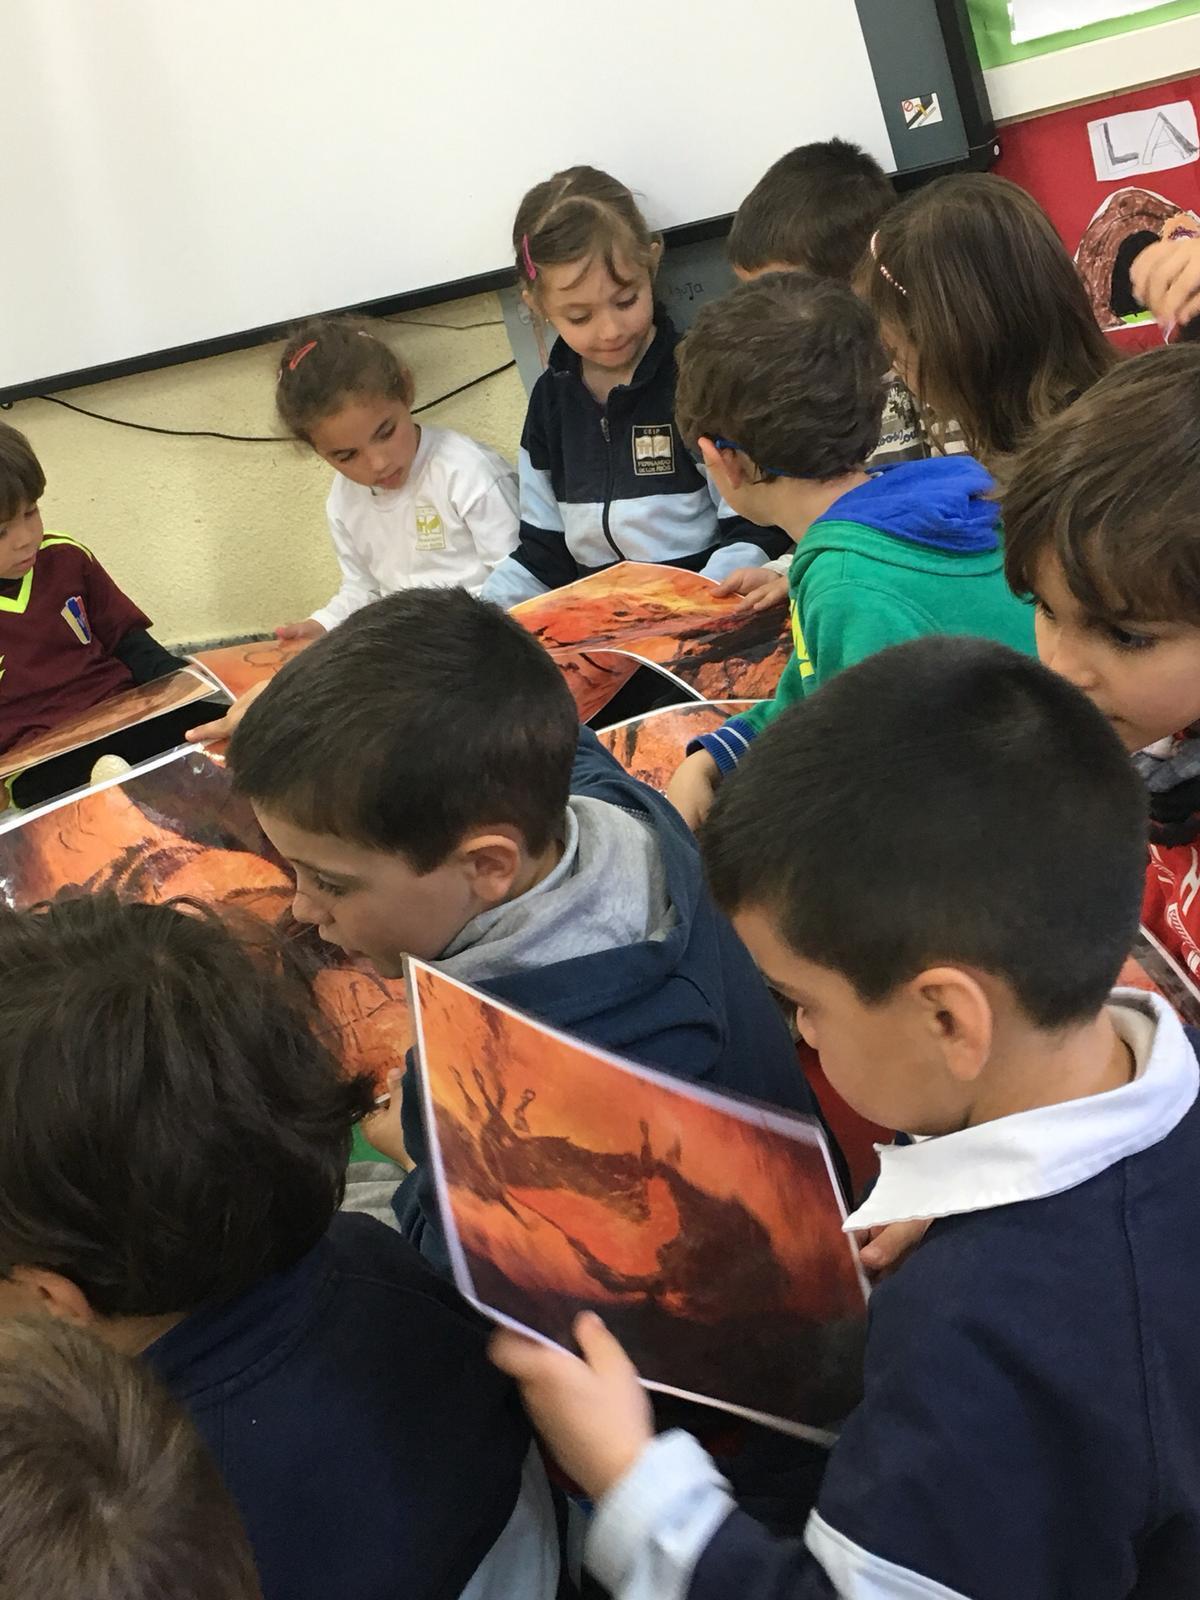 2019_03_15_Infantil 4B descubre la pintura rupestre_CEIP FDLR_Las Rozas 1